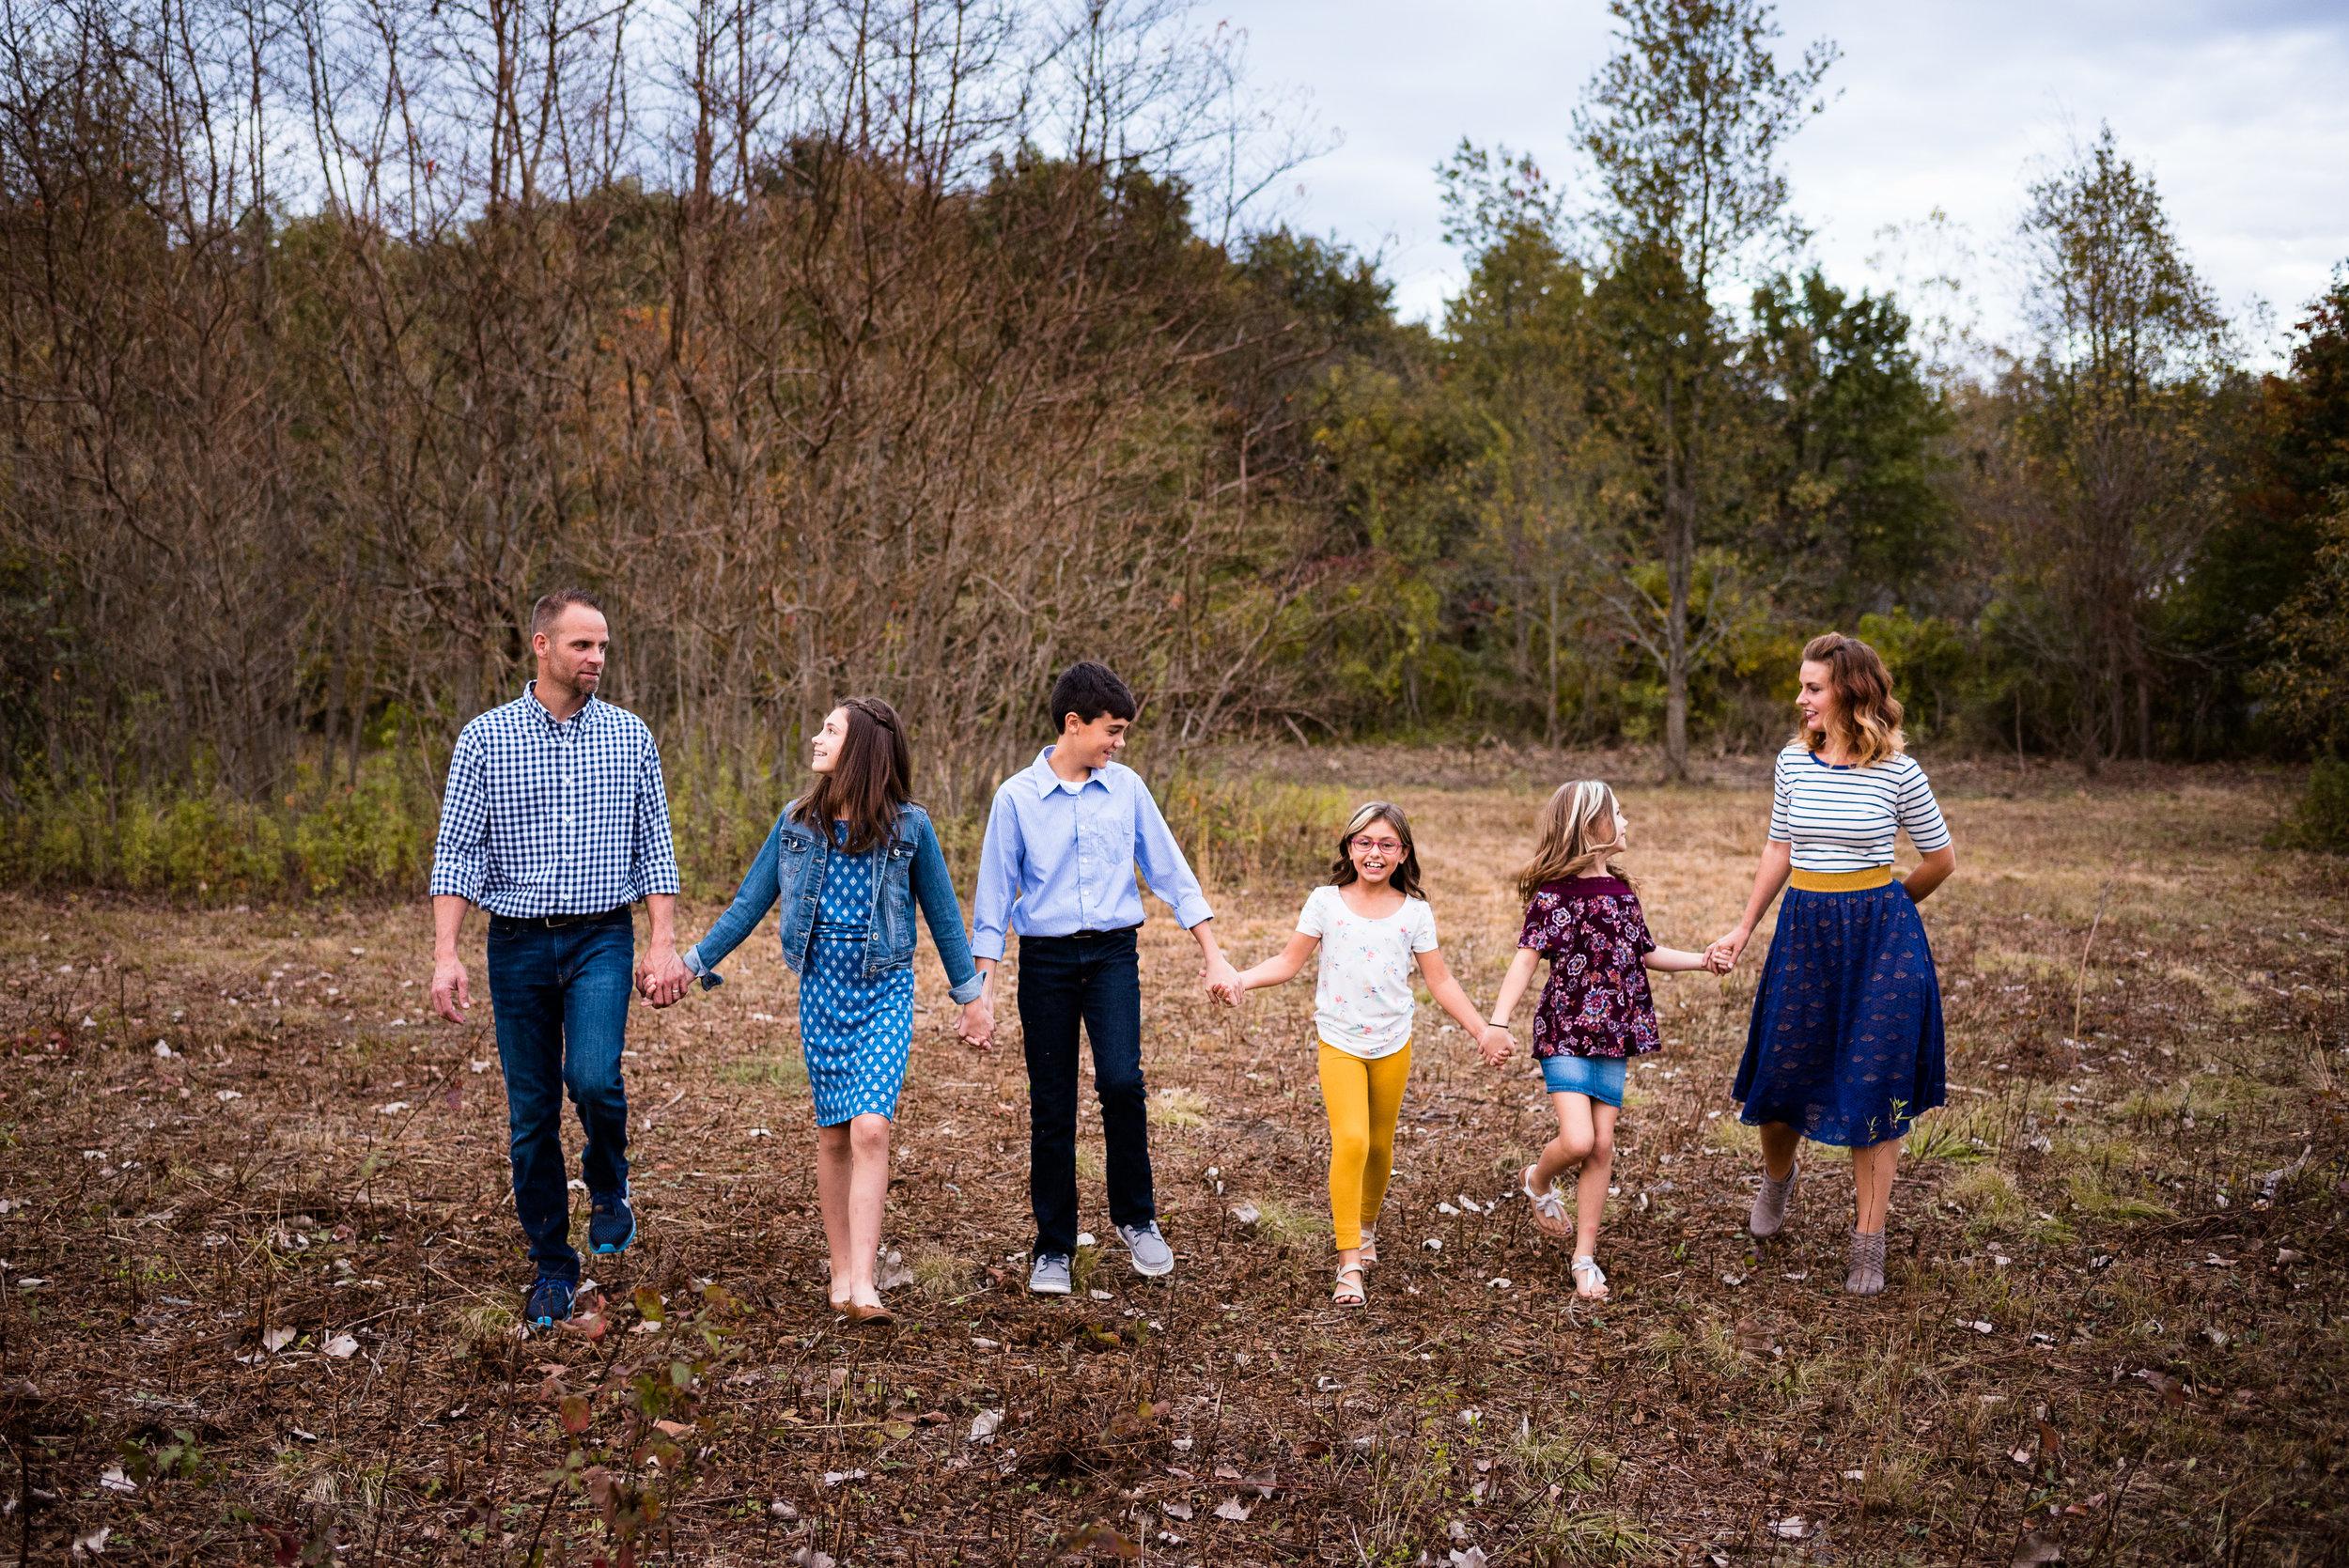 Barfell Family Portraits. Wintergarden Park. Bowling Green, Ohio ...